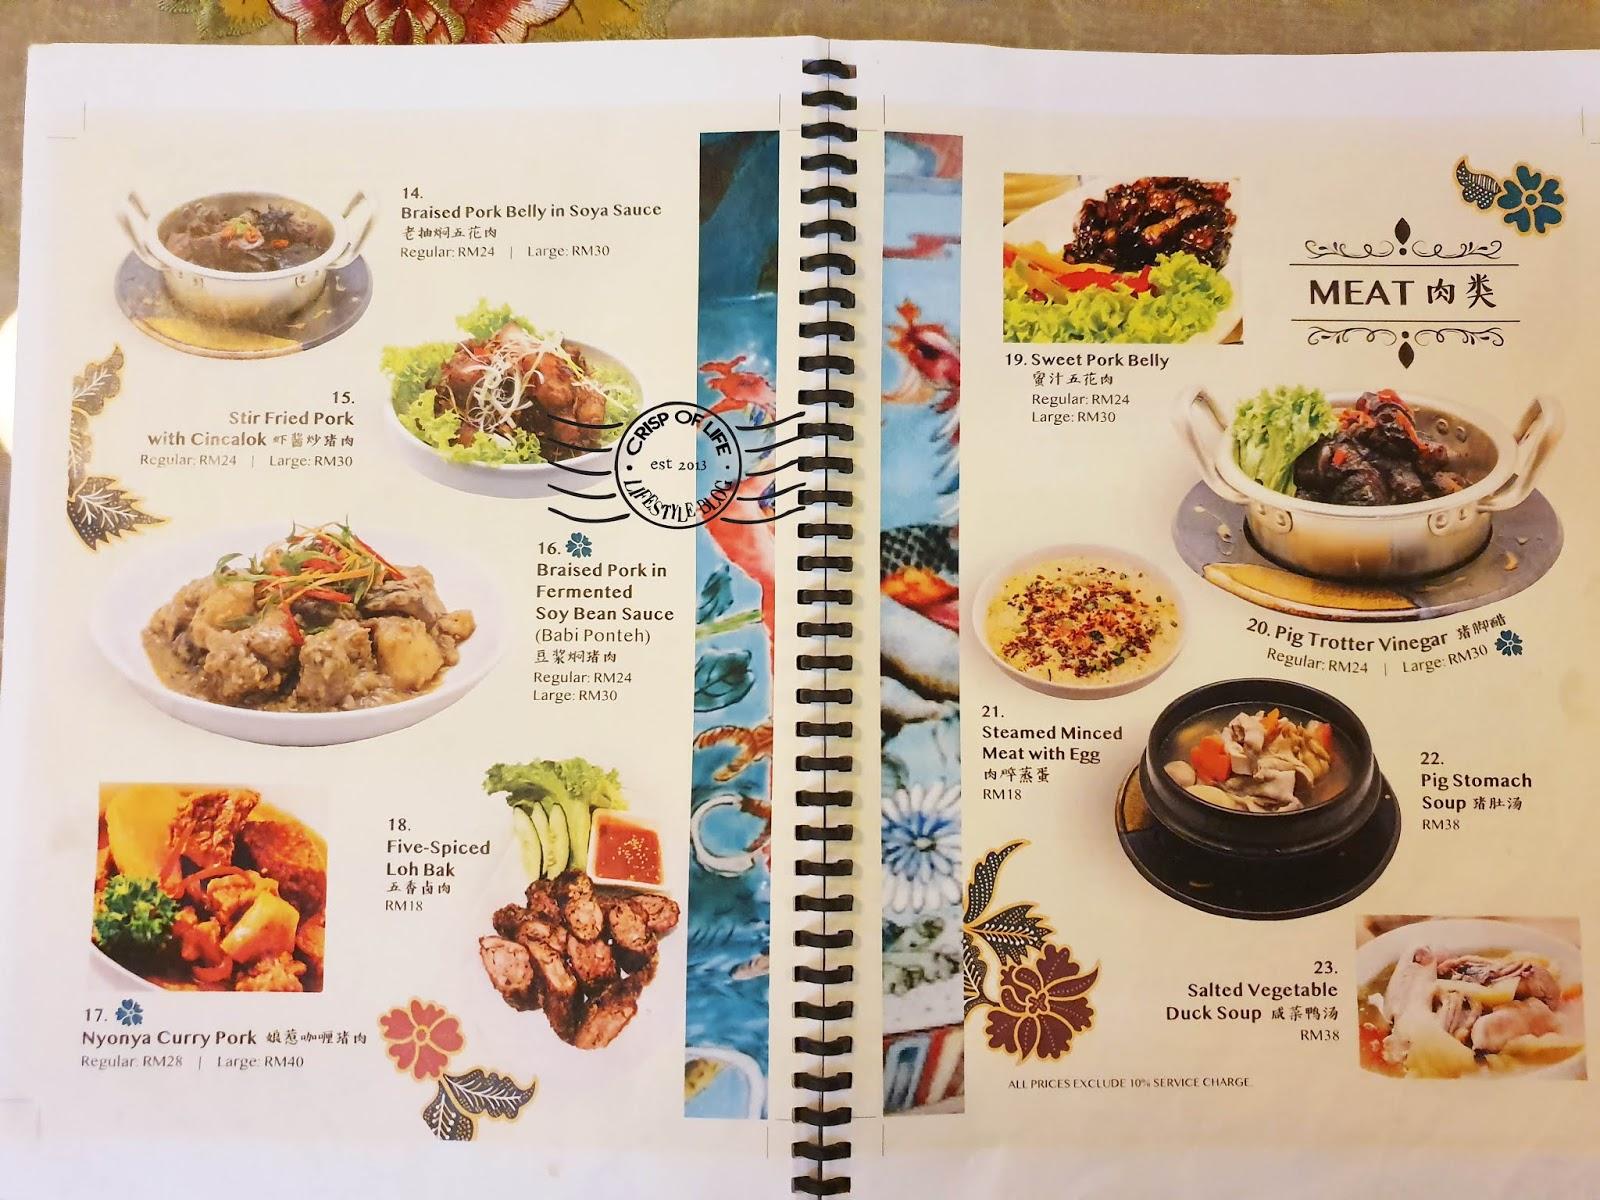 Richard Rivalee Nyonya Cuisine 娘惹之家 @ Rain Garden Hotel, Lebuh Burmah, Penang